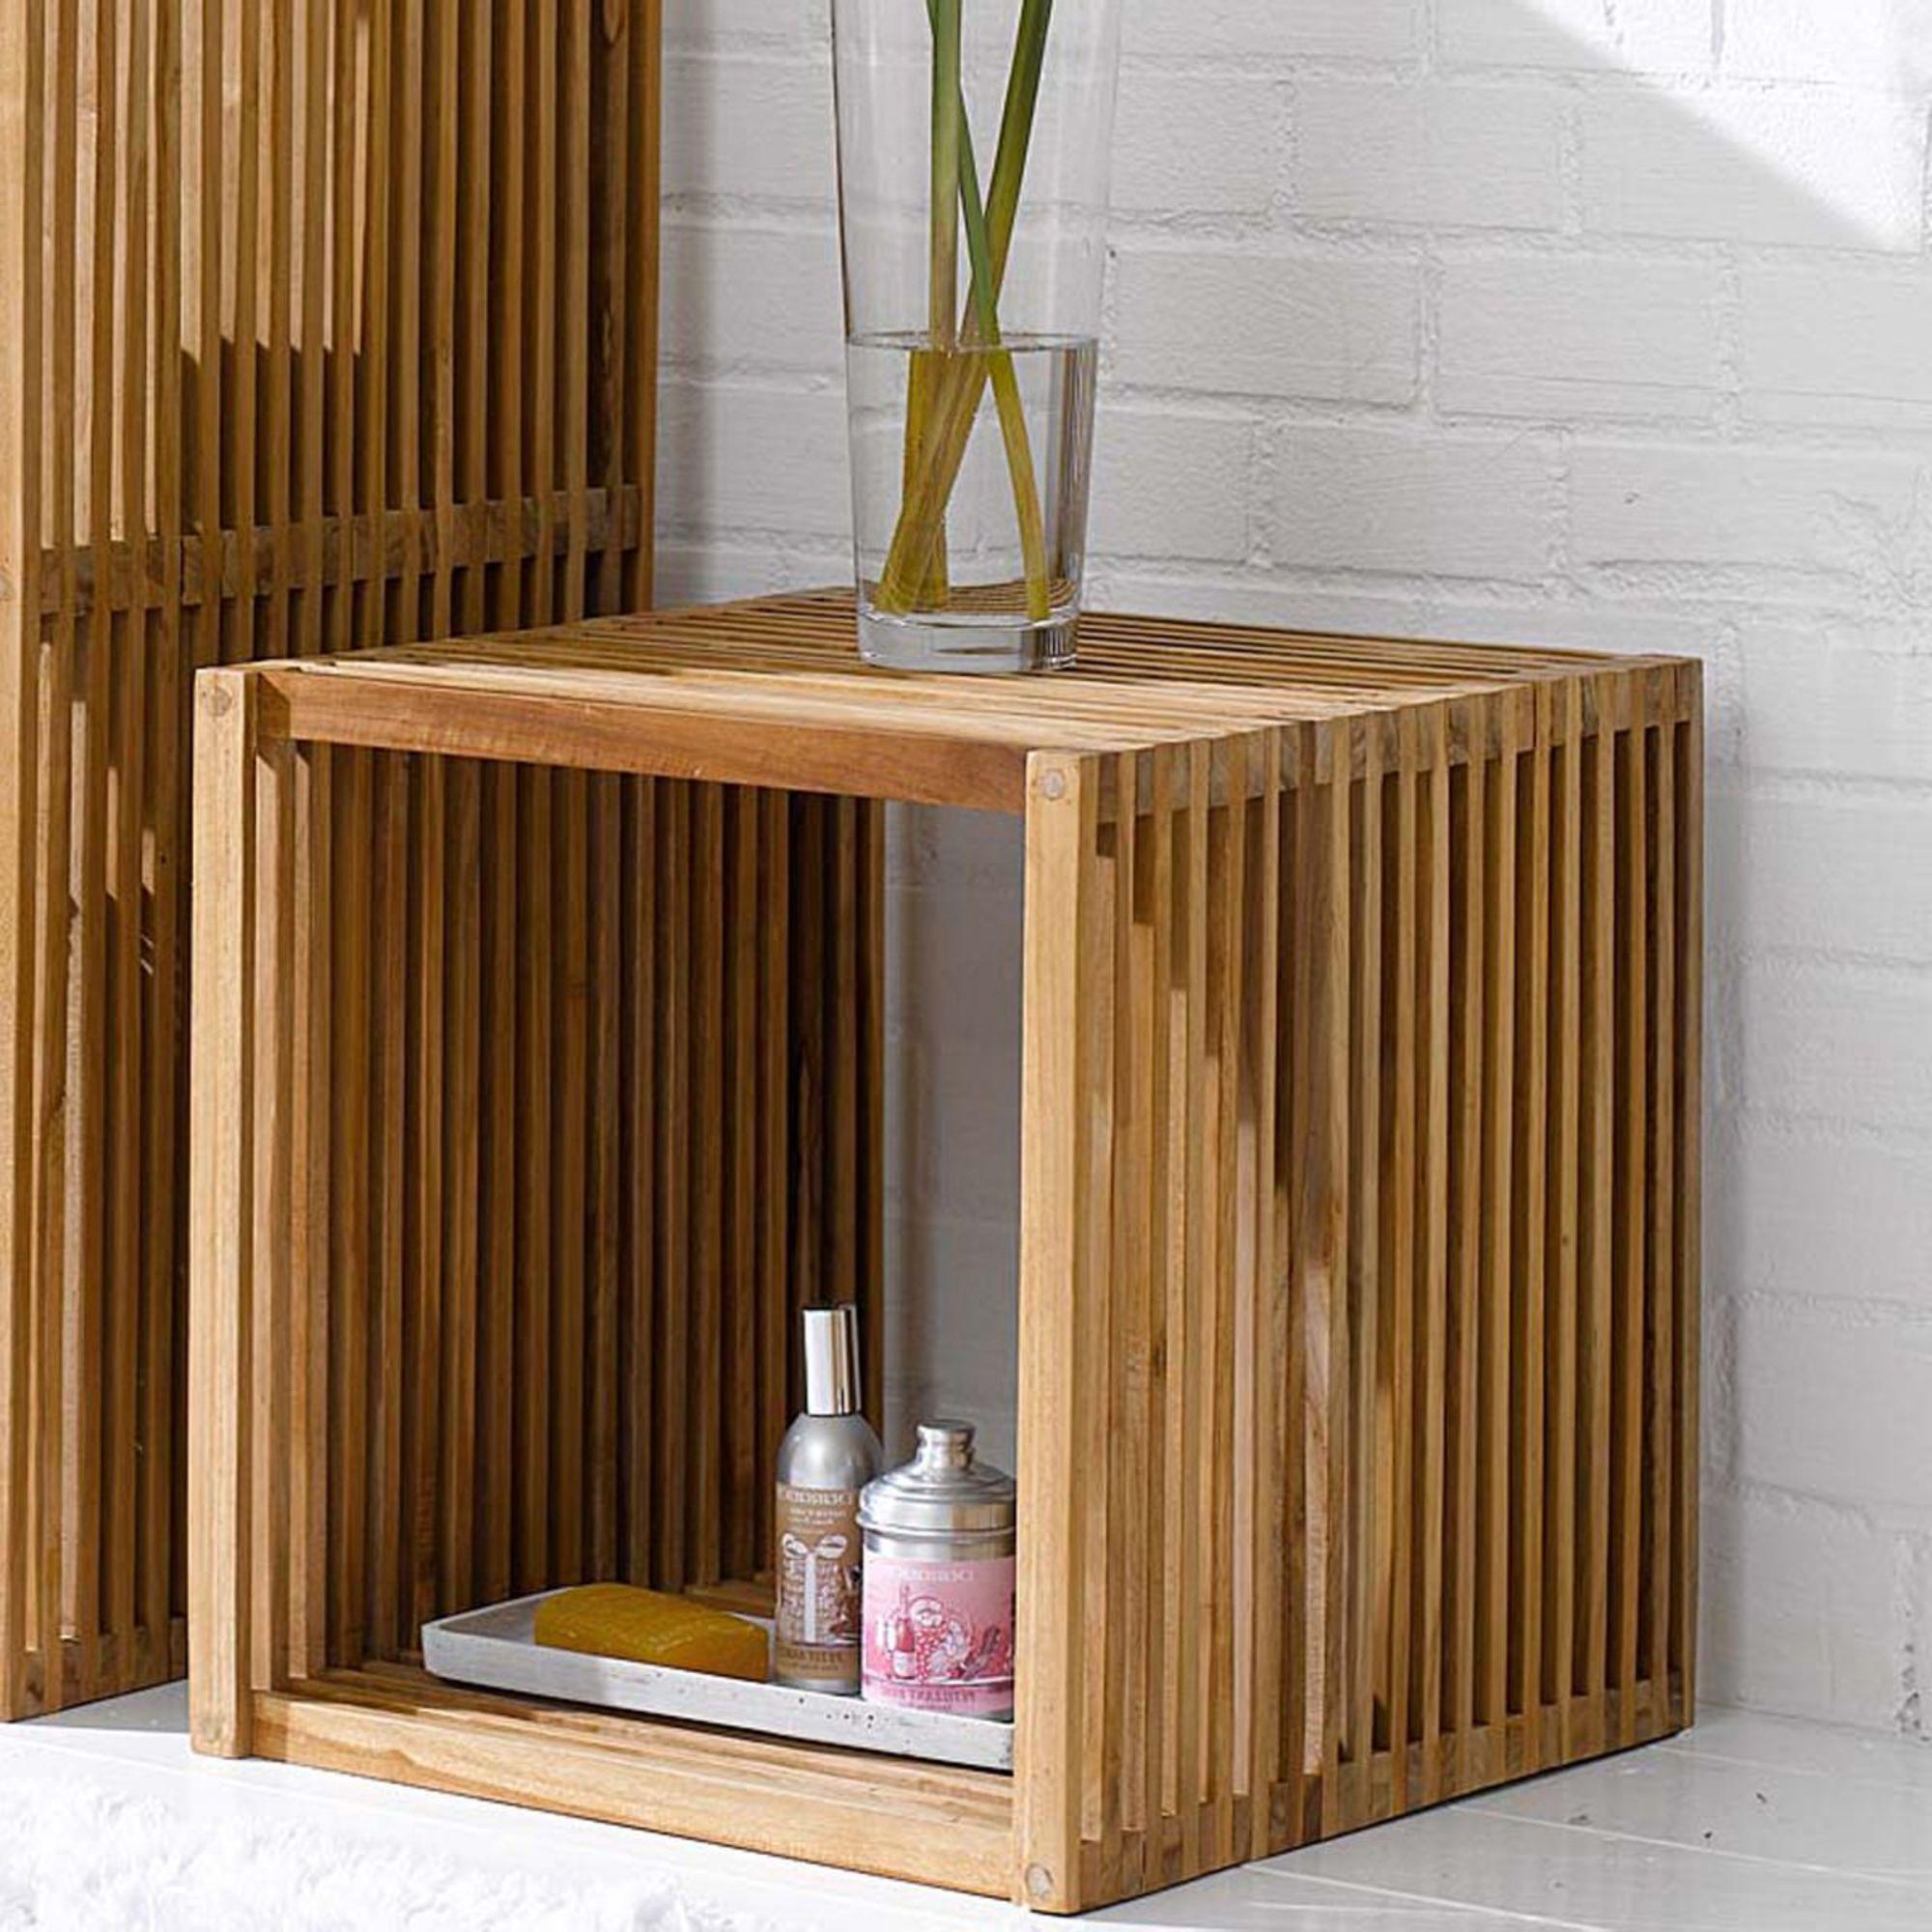 regal cube regal wurfel bucherregal ikea billy elegant fabulous interesting top with cube weiss. Black Bedroom Furniture Sets. Home Design Ideas